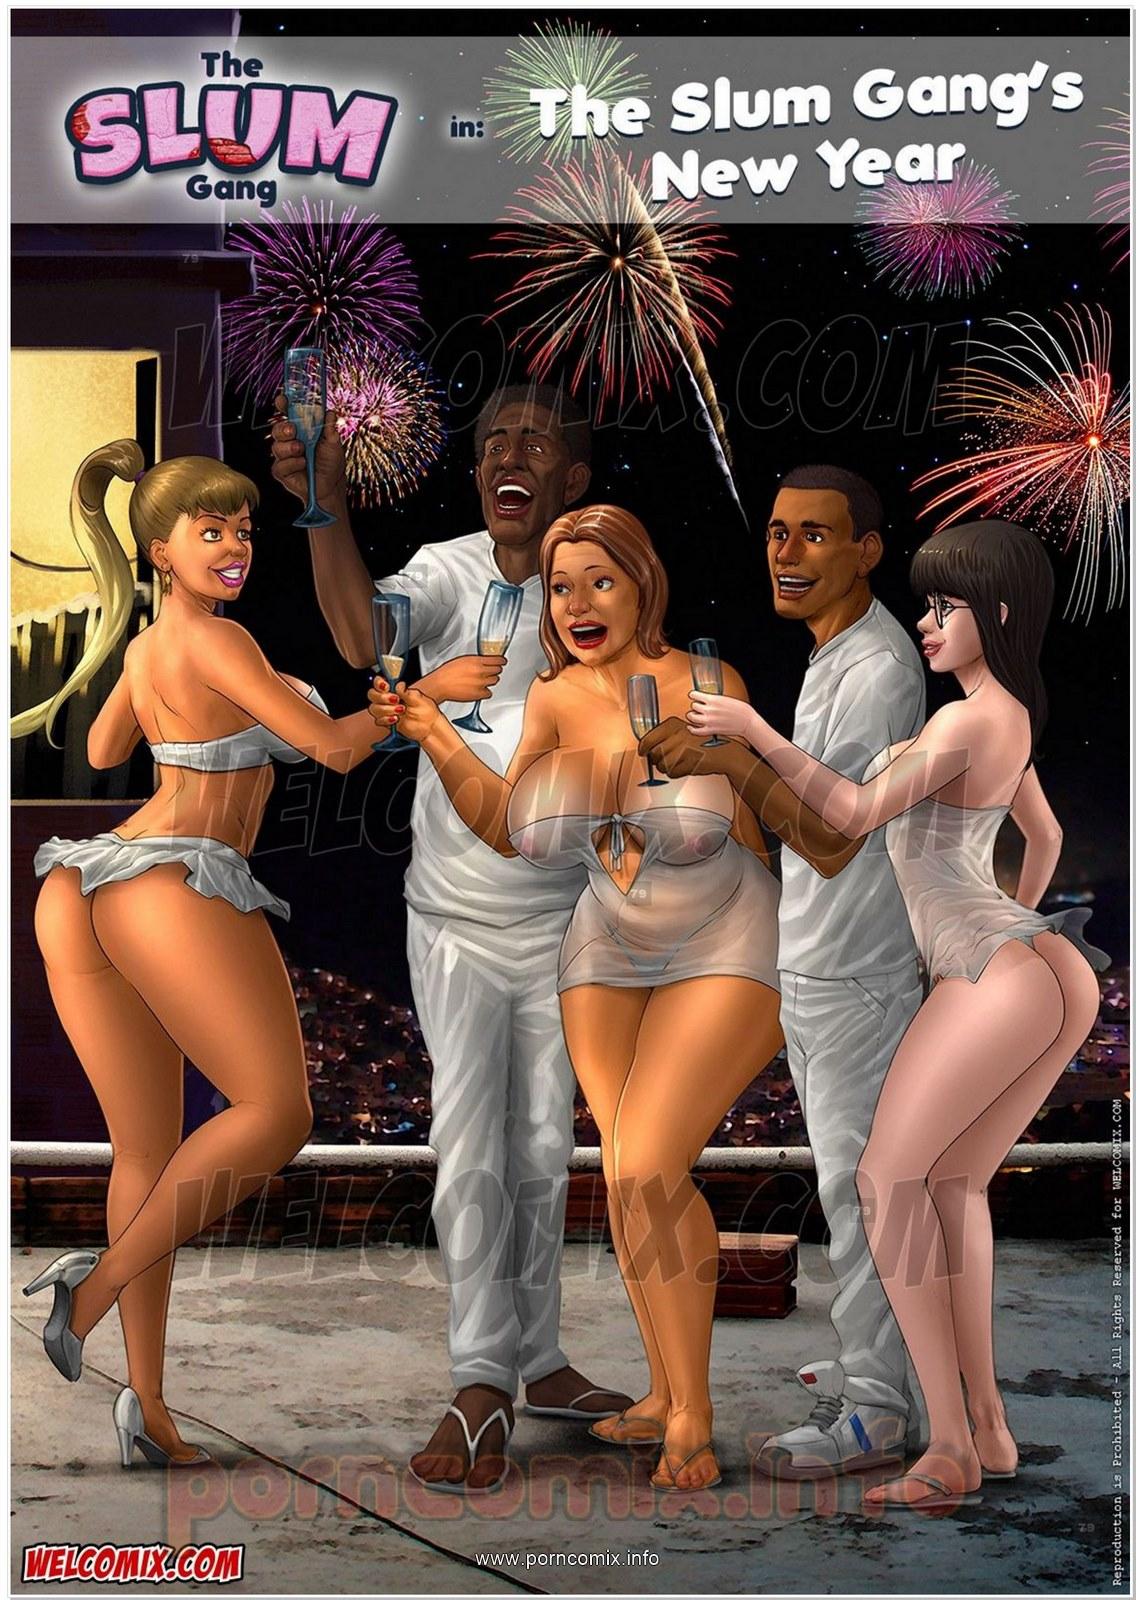 Porn Comics - Brazilian Slumdogs 5- Slum Gang's New Year porn comics 8 muses